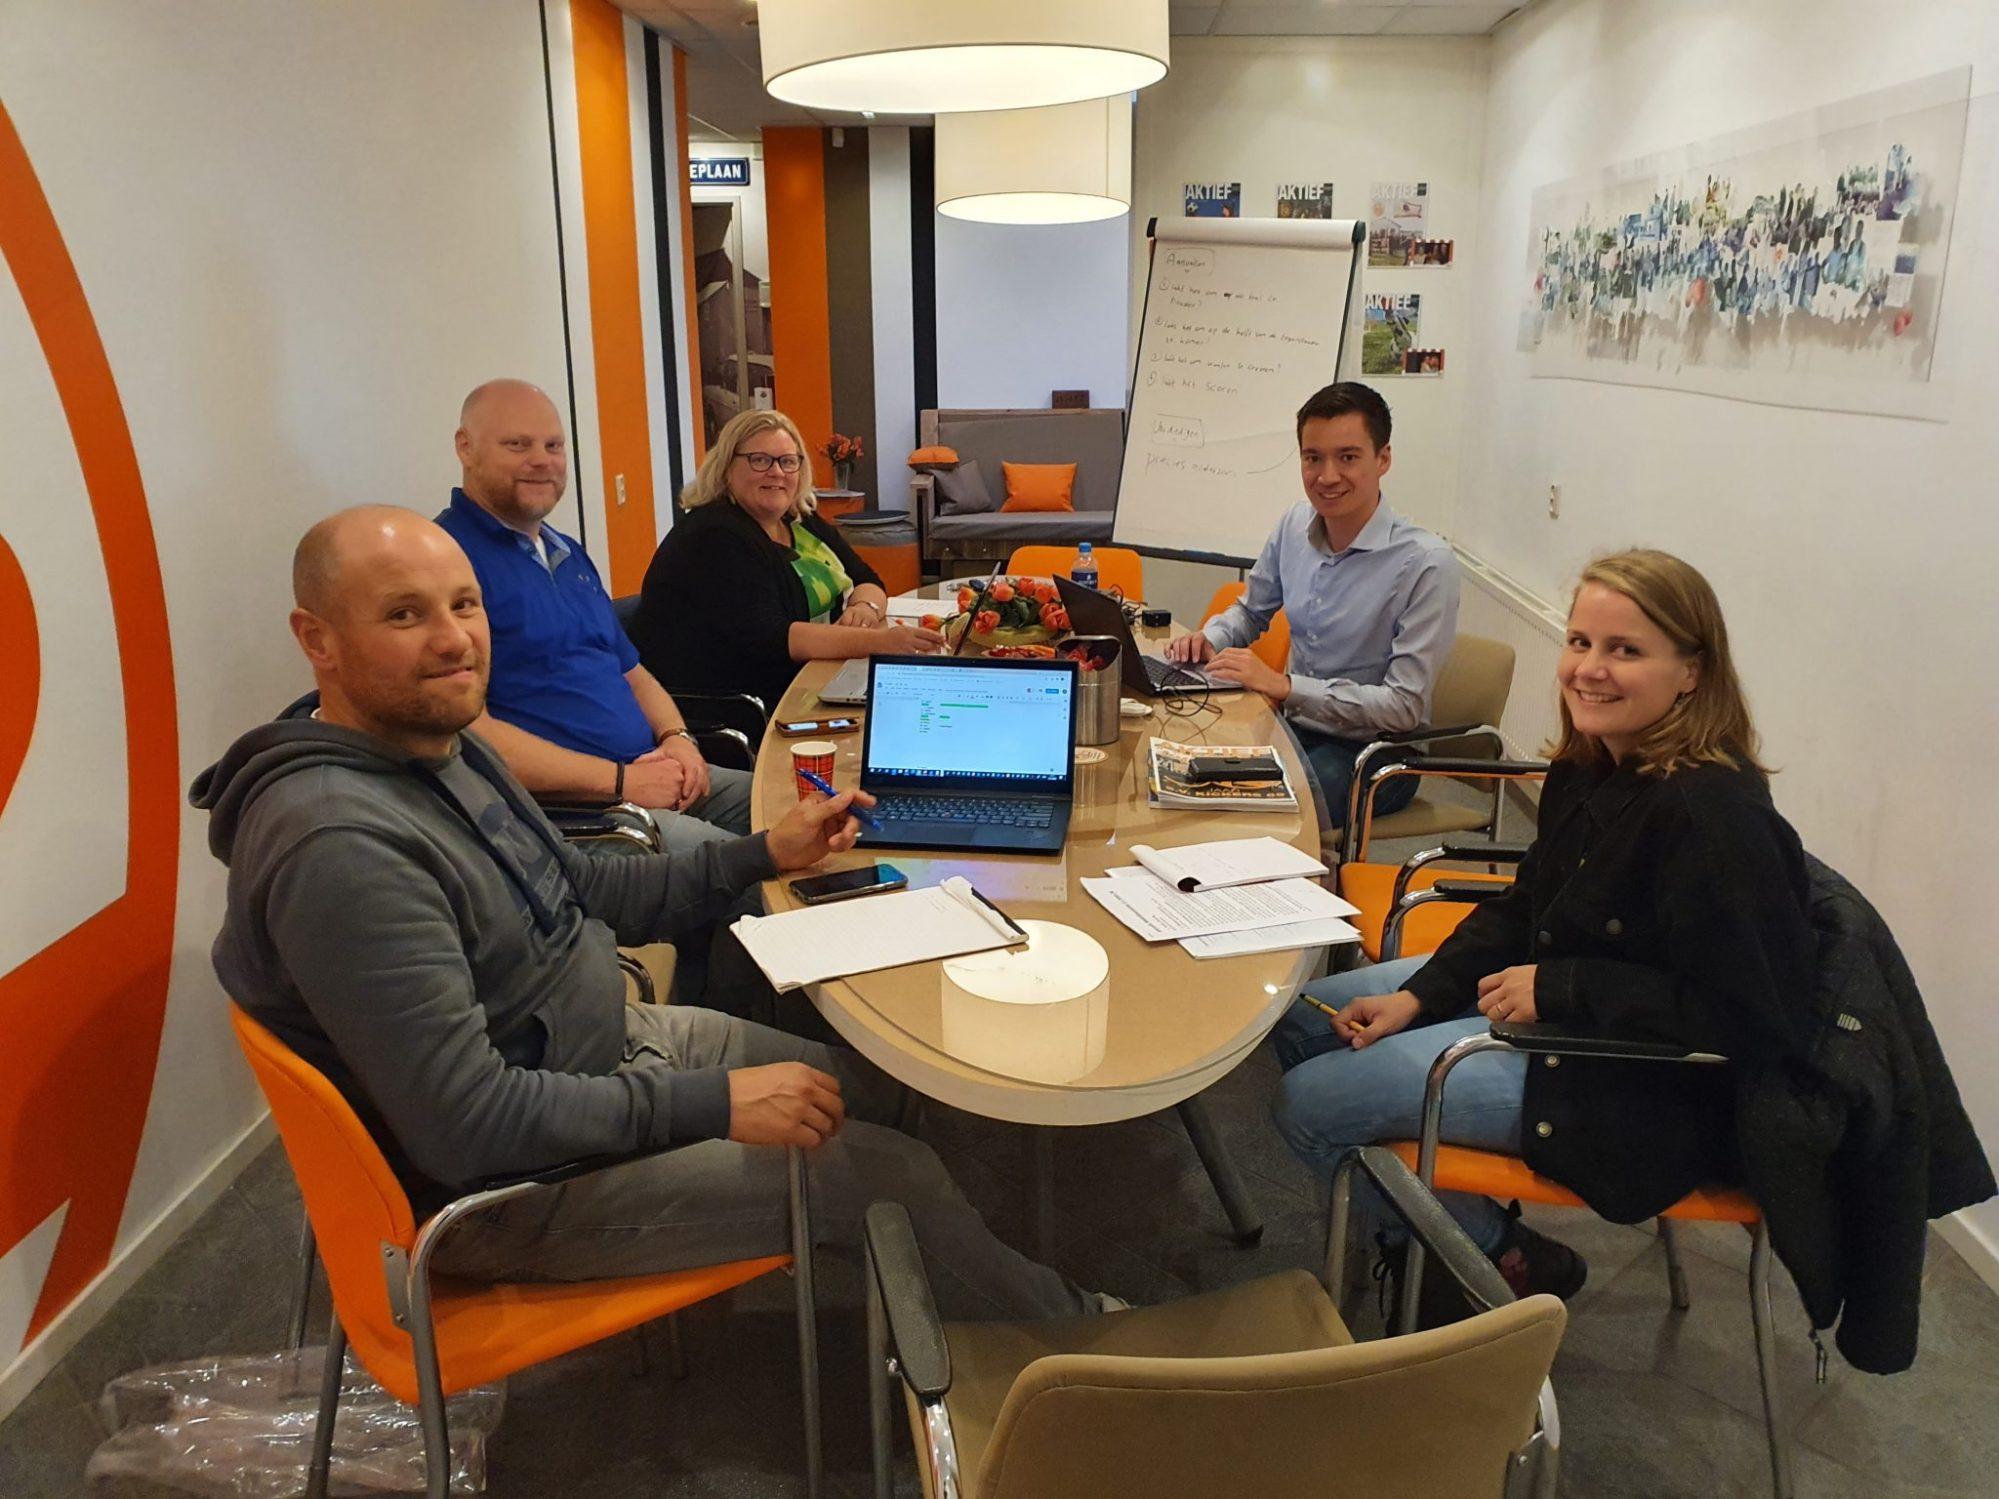 De Vrijwilligerscommissie, v.l.n.r. Daan van der Sar, Jos Braakman, Ingrid Mollers, Roy Möllers en Roos van der Zwaan